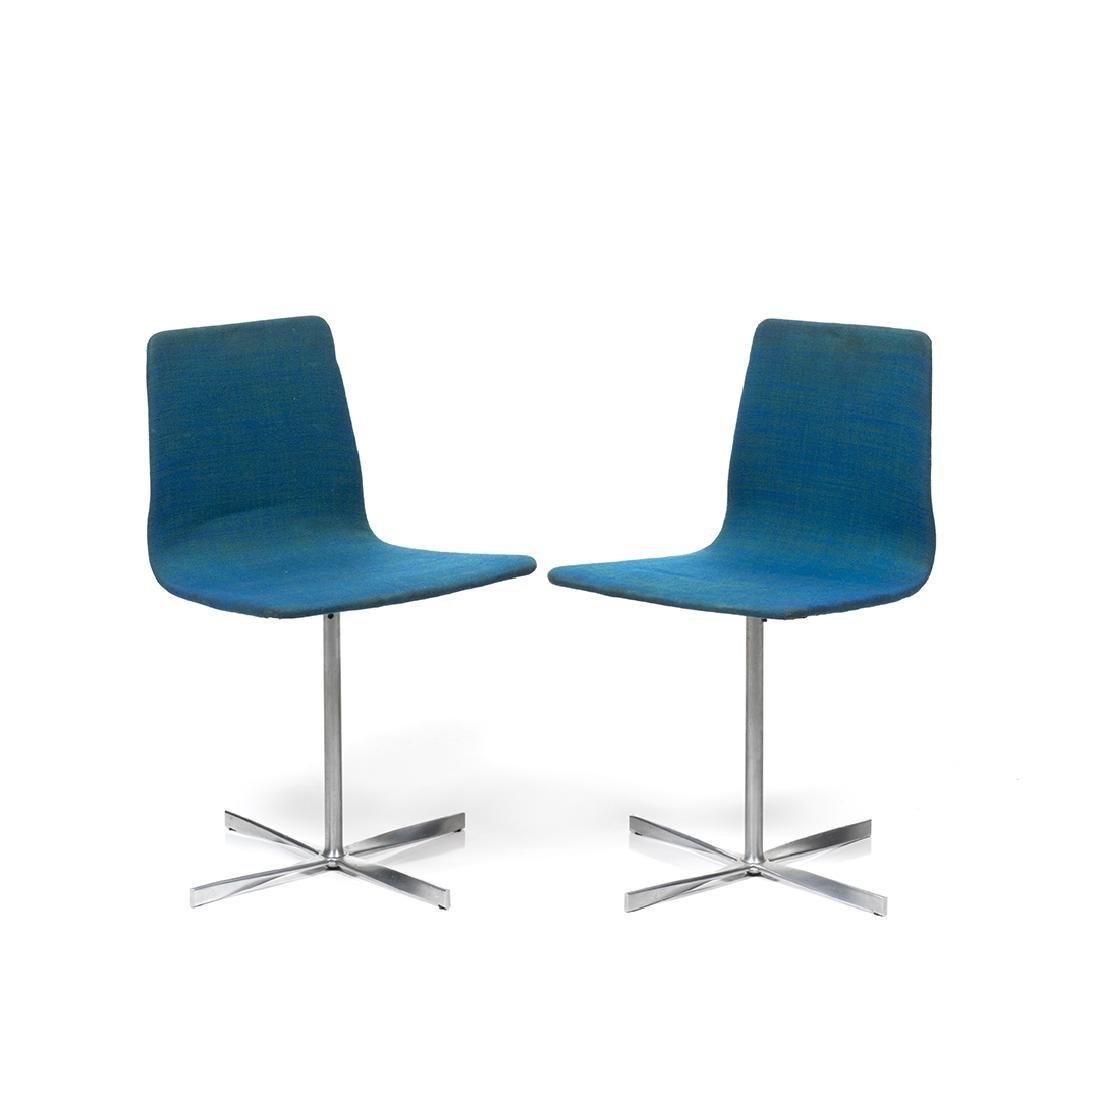 Danish Side Chairs